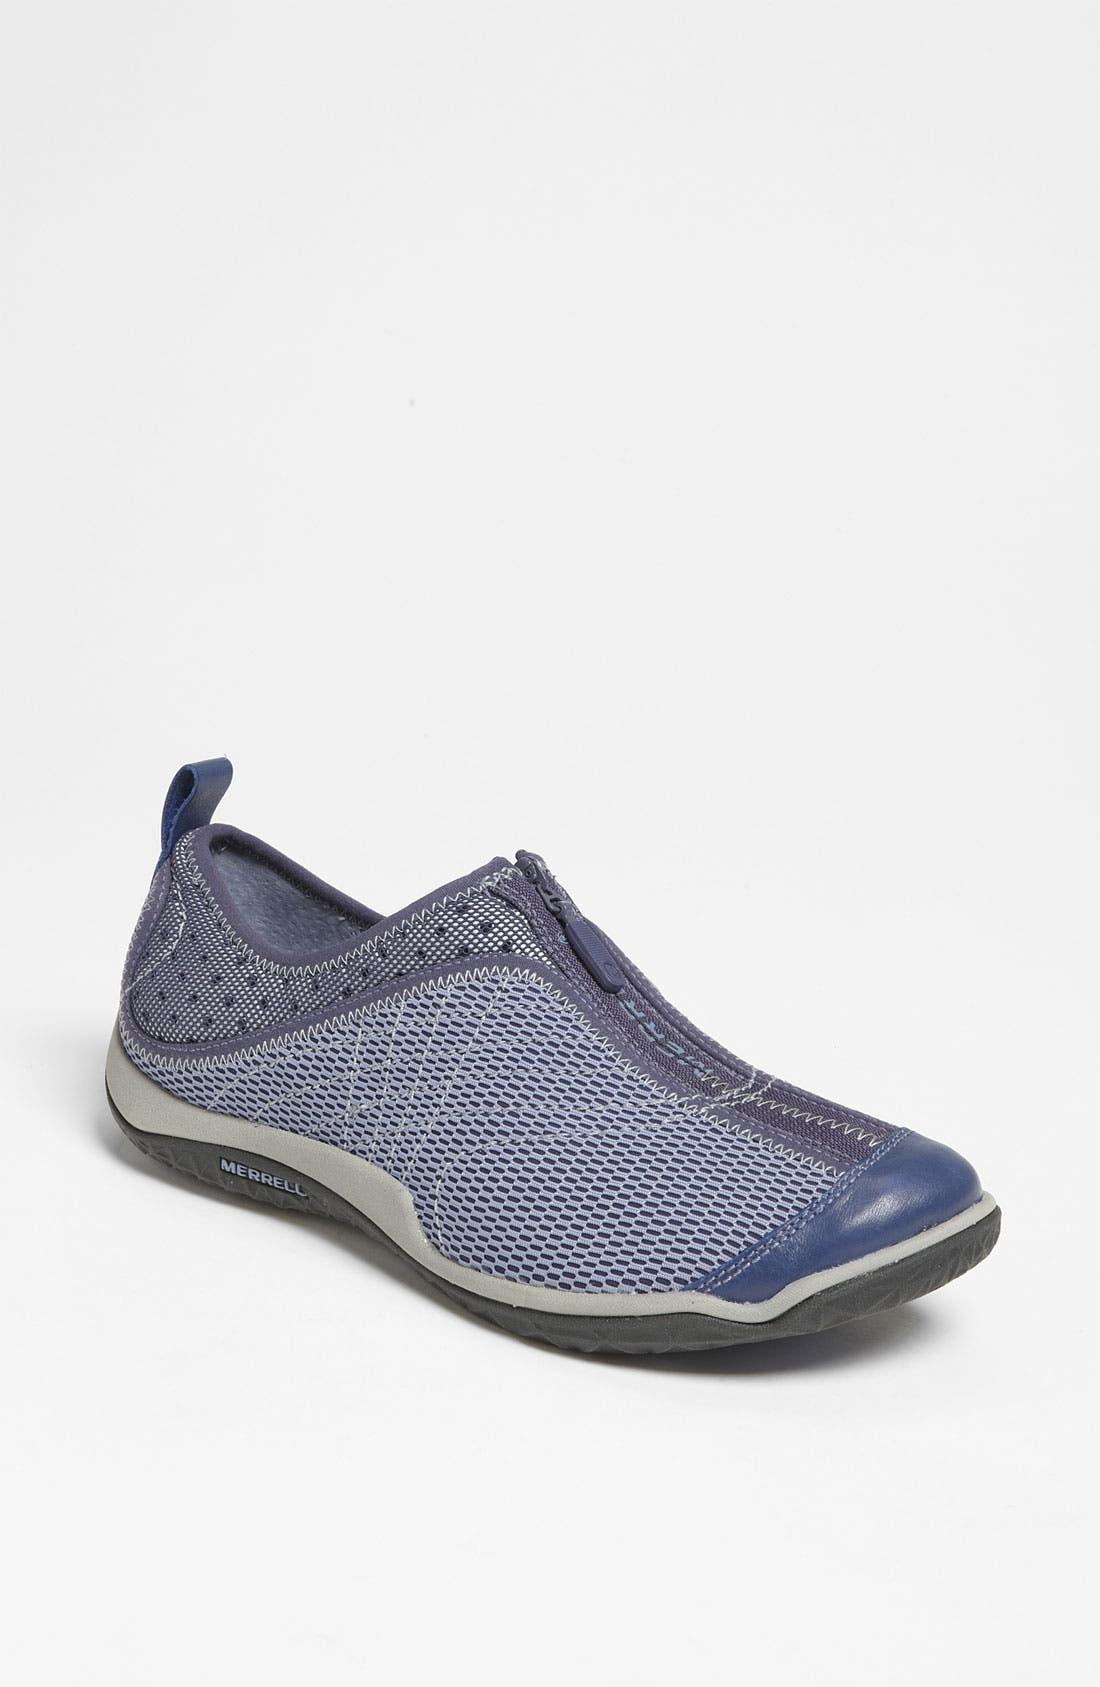 Main Image - Merrell 'Lorelei' Sneaker